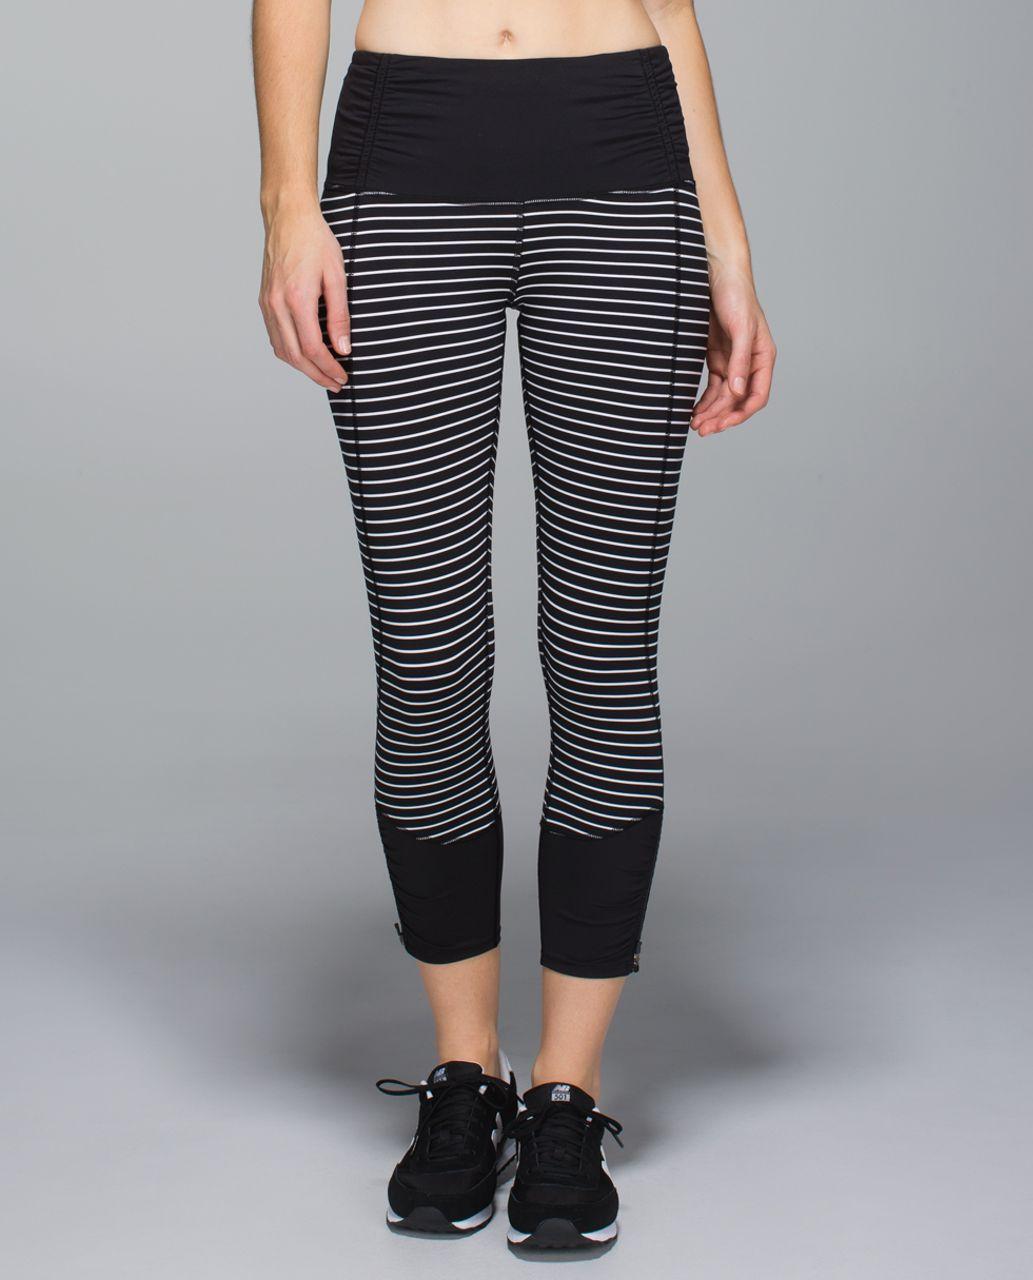 bdec793470 Lululemon Runday Crop - Parallel Stripe White Black / Black - lulu fanatics